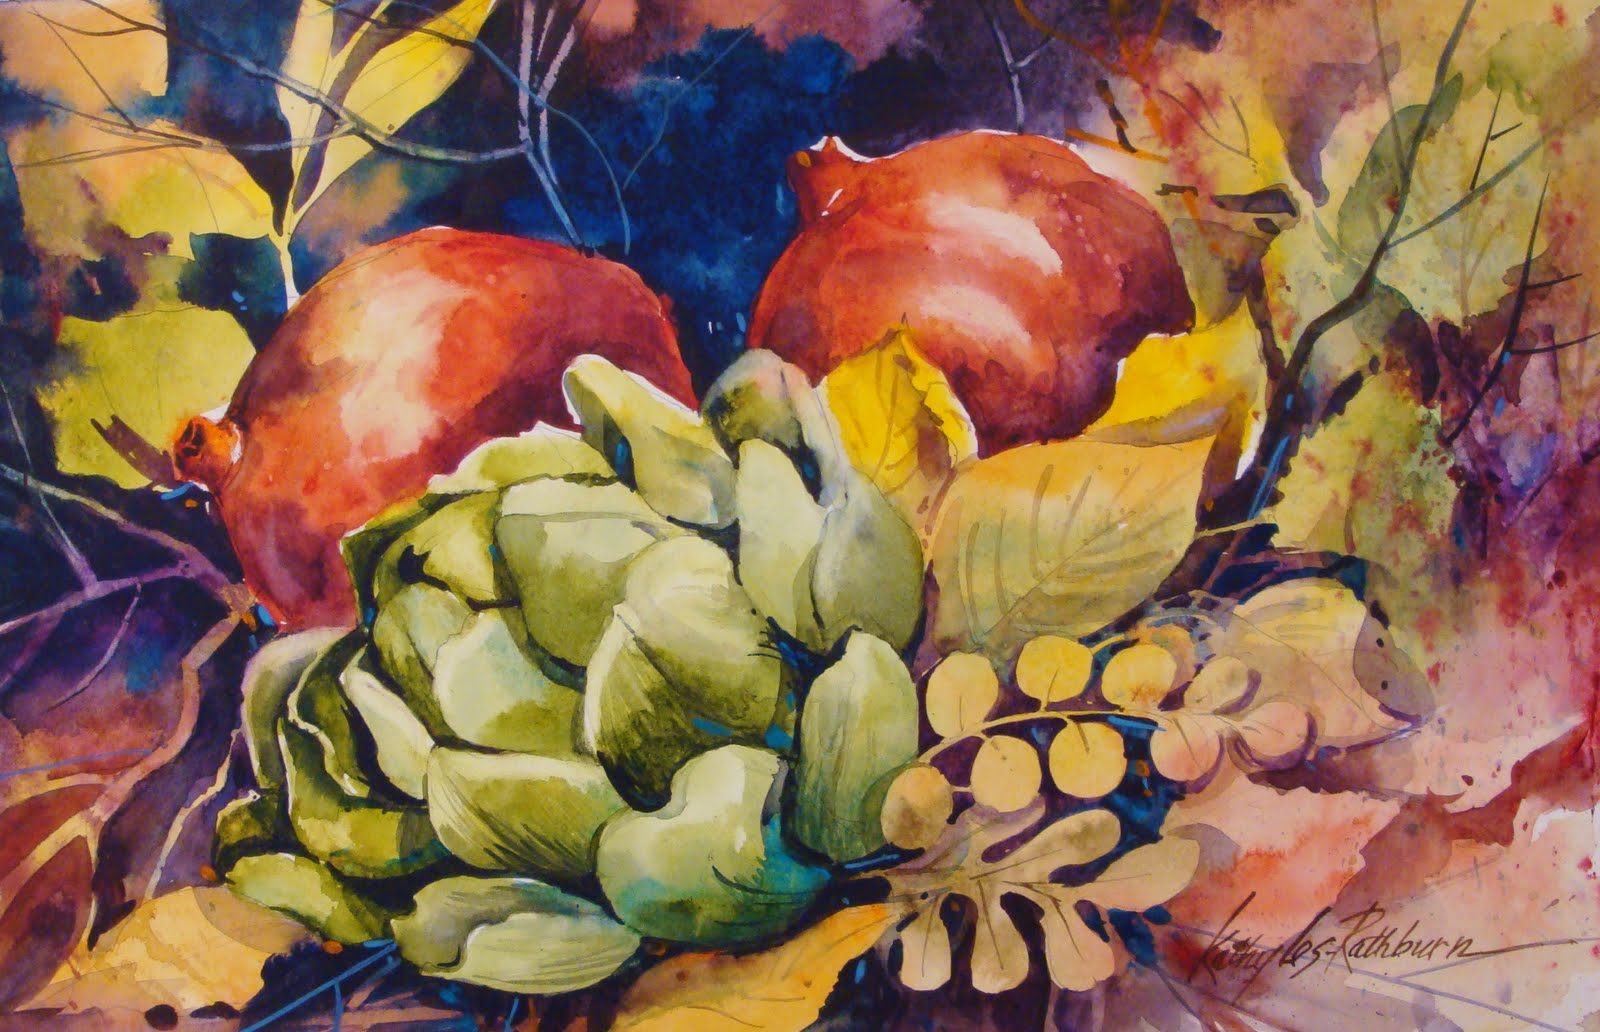 """Fall Still Life II"" original fine art by Kathy Los-Rathburn"